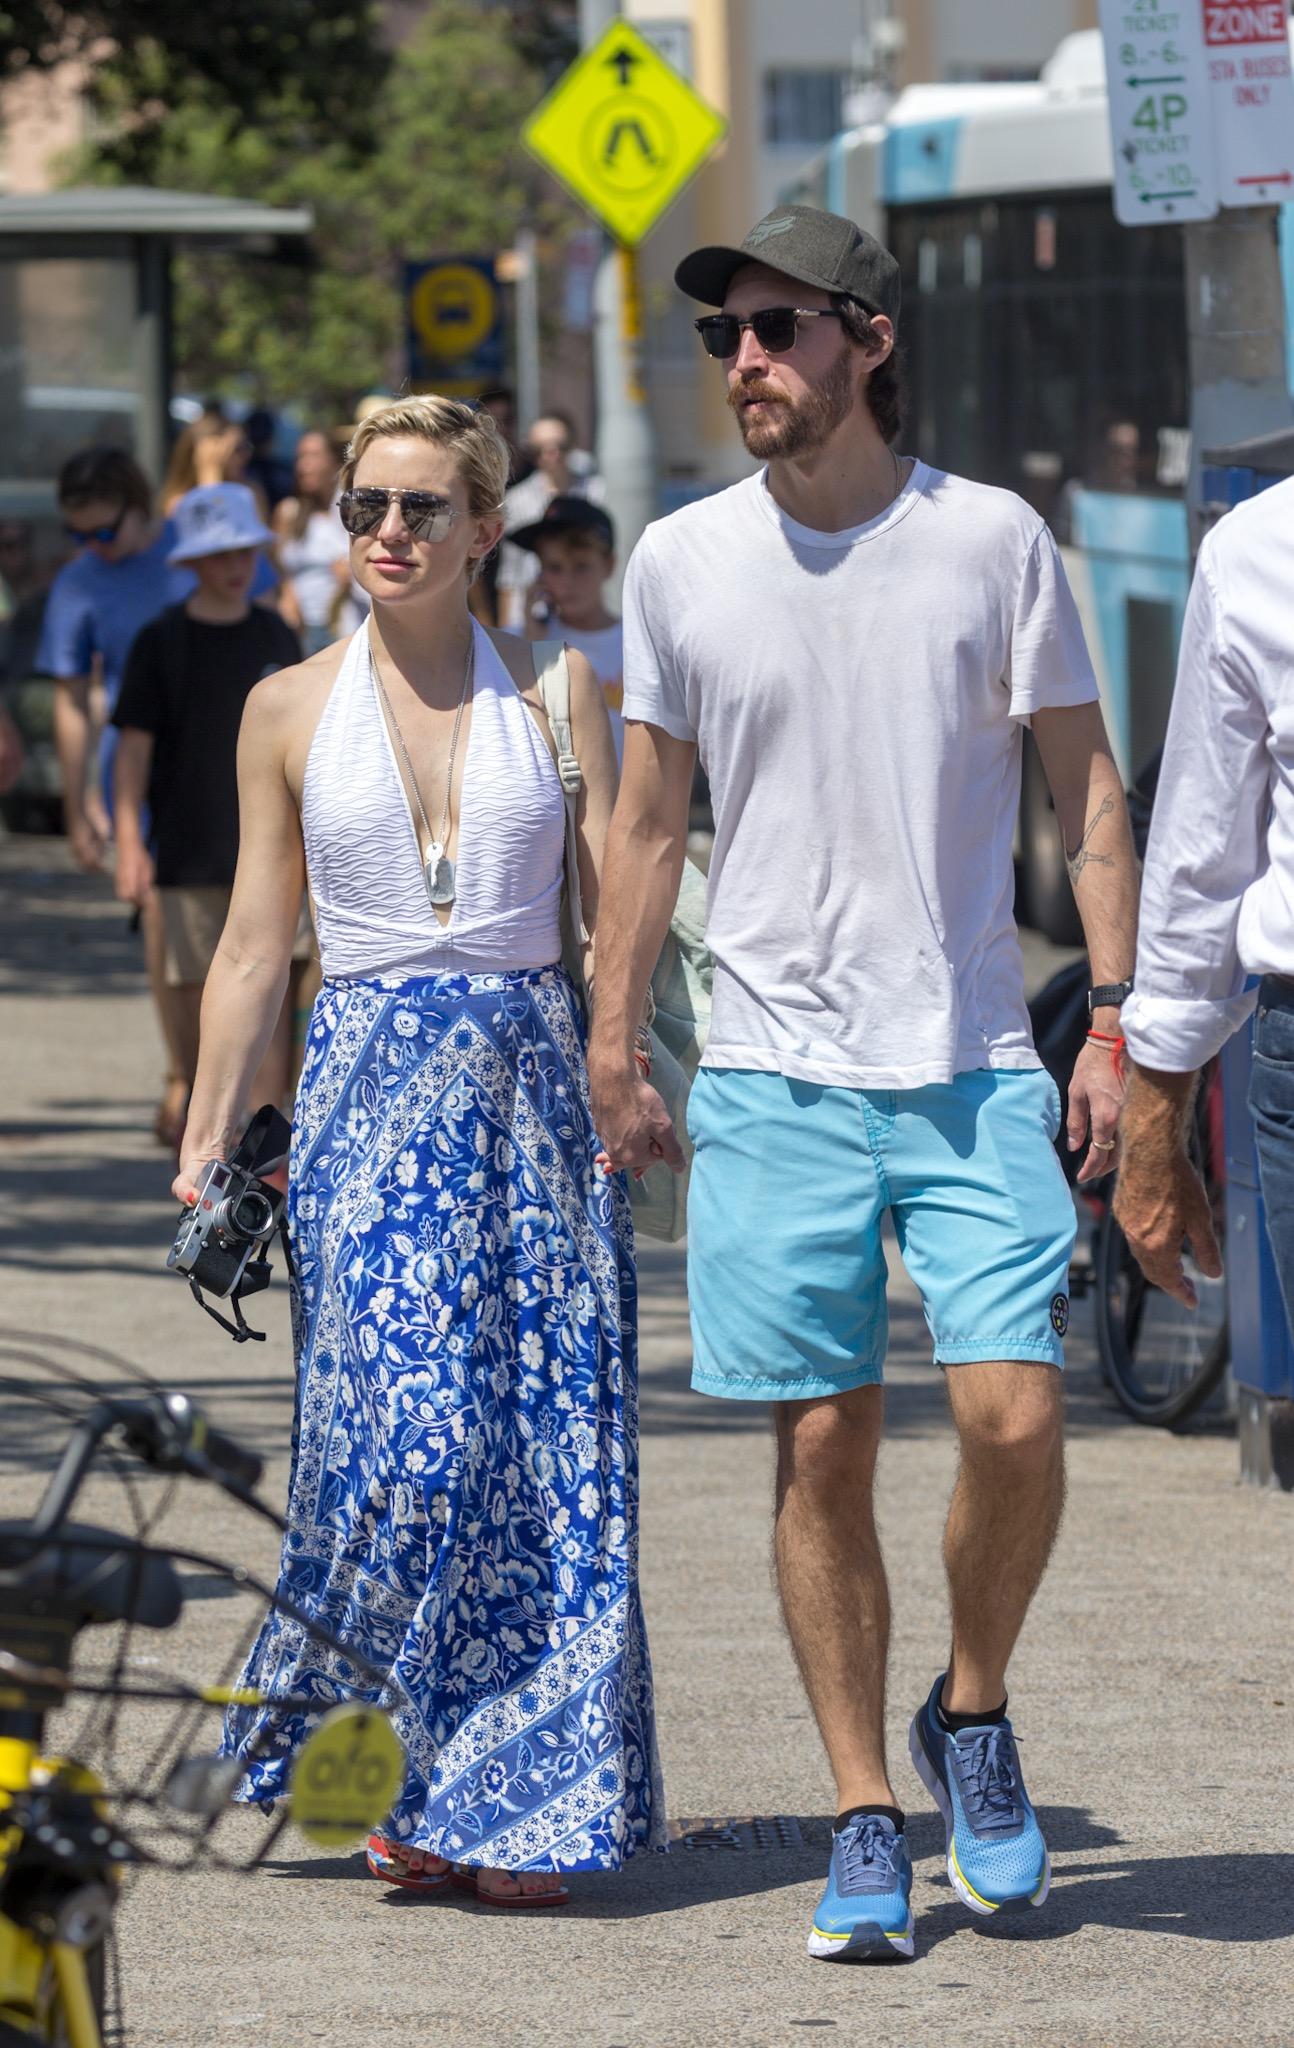 *NO MAIL ONLINE* Kate Hudson and boyfriend, Danny Fujikawa enjoy an afternoon stroll around Bondi in Australia  <P> Pictured: Kate Hudson, Danny Fujikawa <B>Ref: SPL1660195  180218  </B><BR/> Picture by: Media-Mode / Splash News<BR/> </P><P> <B>Splash News and Pictures</B><BR/> Los Angeles:310-821-2666<BR/> New York:212-619-2666<BR/> London:870-934-2666<BR/> <span id=